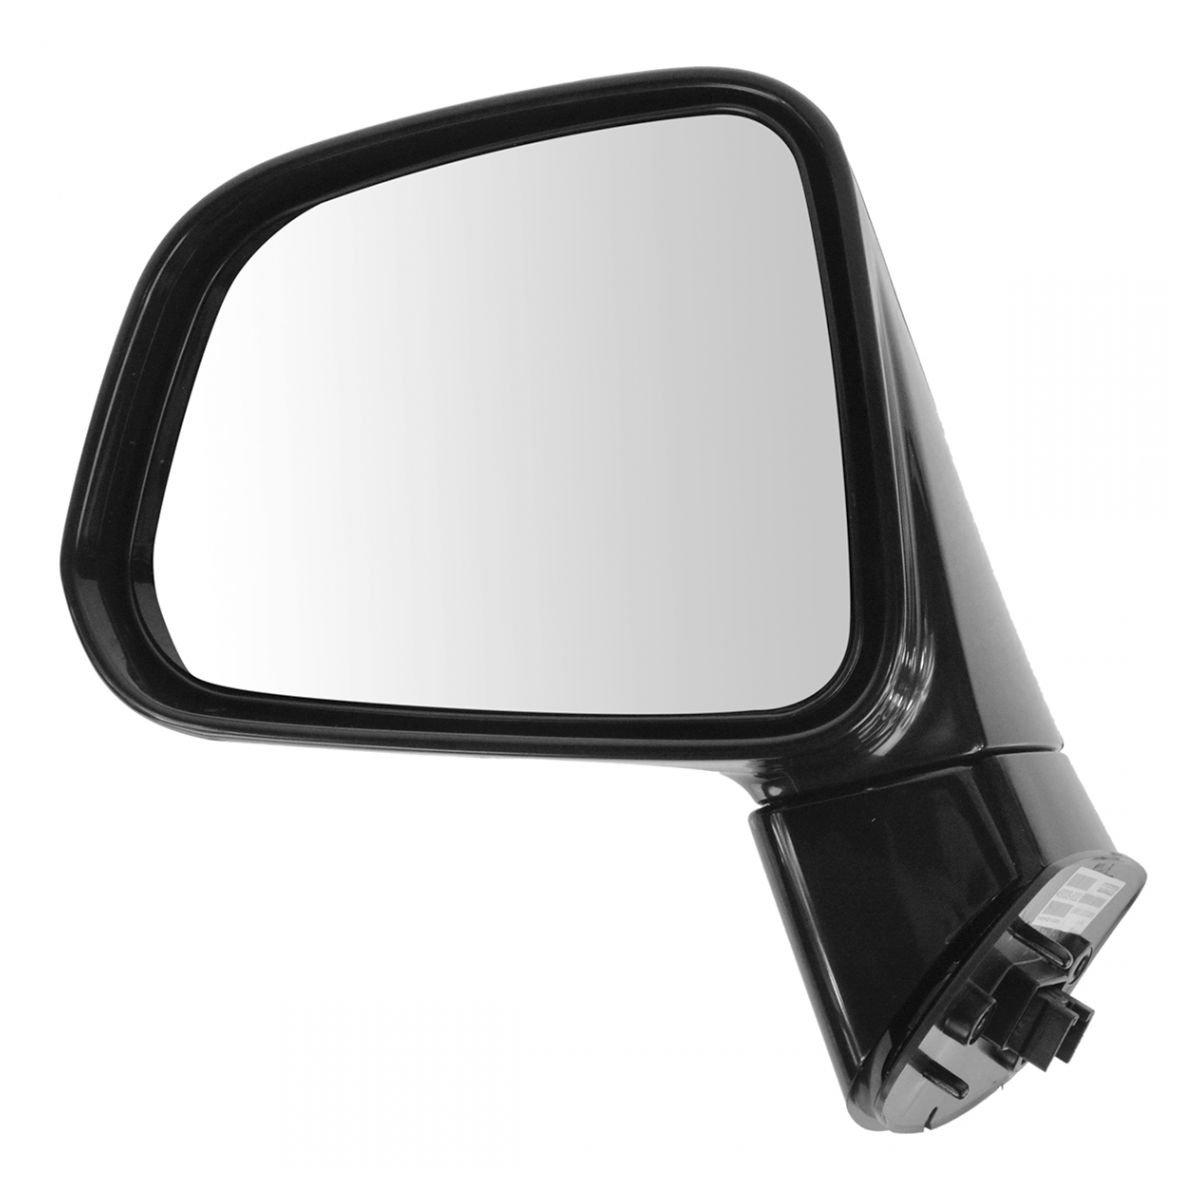 CHEVROLET CAPTIVA SPORT SATURN VUE Right Door Passenger Side Mirror Glass